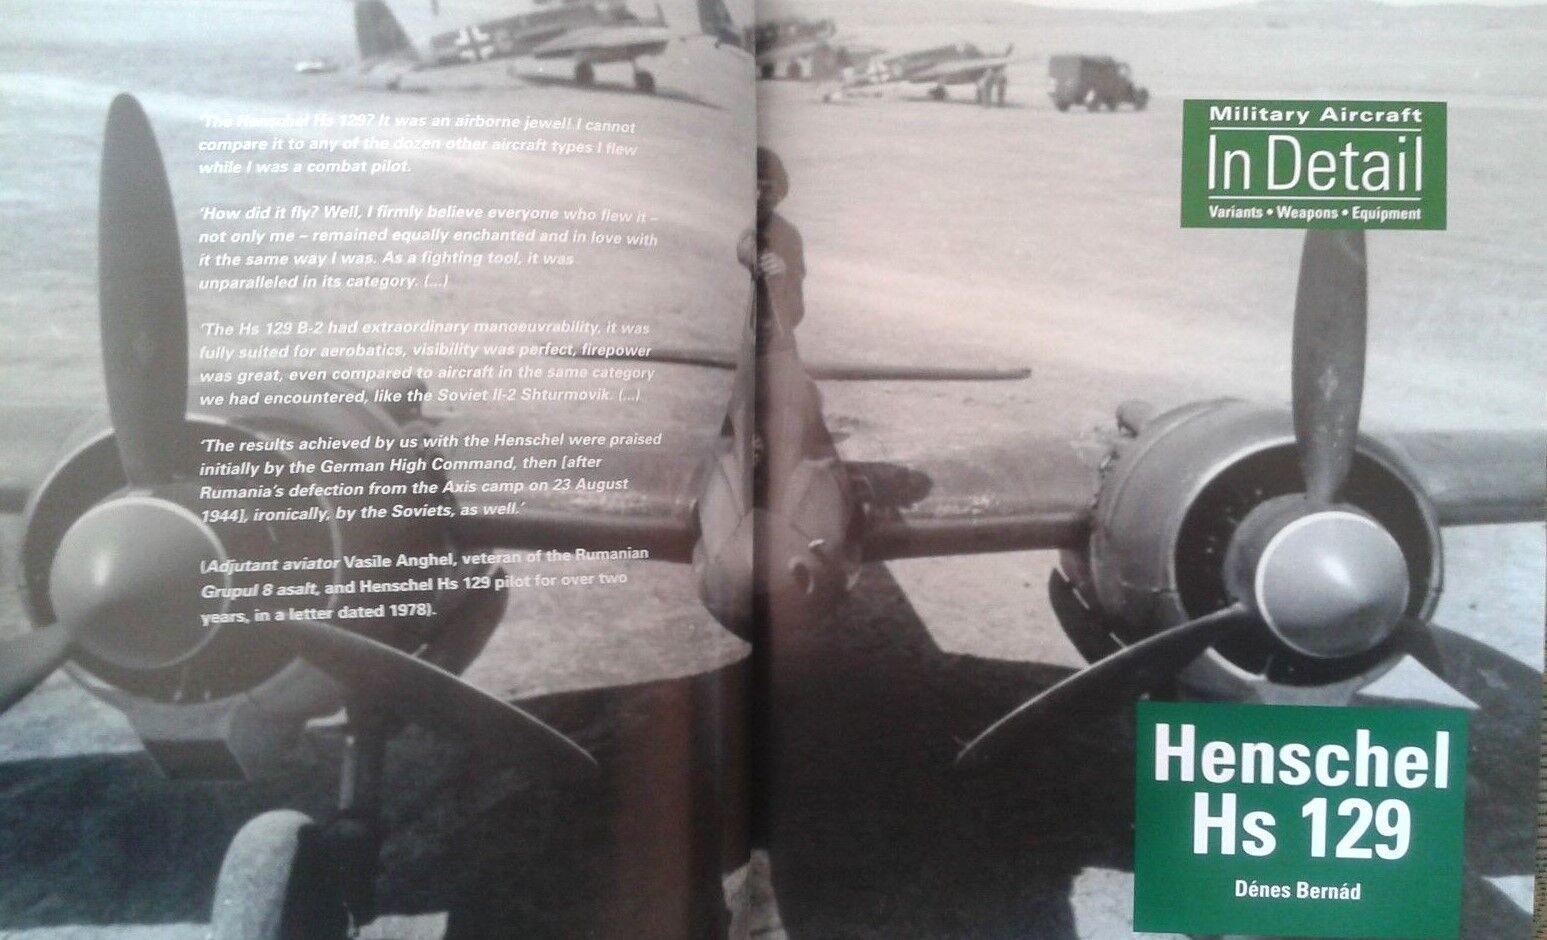 HENSCHEL HS129 BY DENES BERNAD- MILITARY AIRCRAFT IN DETAIL